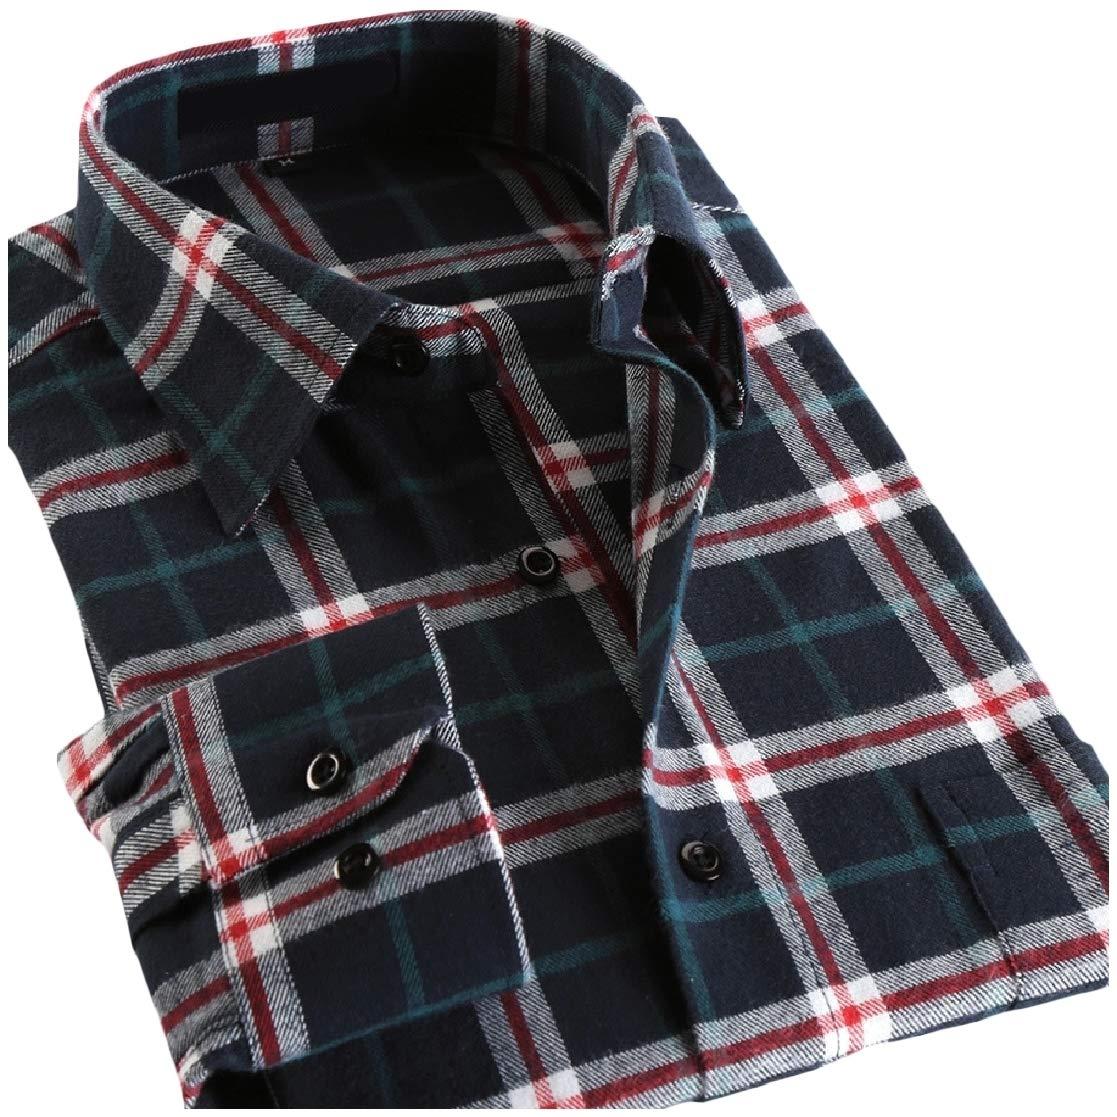 YUNY Mens Plaid Lounge Button Long-Sleeve Lapel Cotton Slim Tees Top Shirts Pattern18 2XL